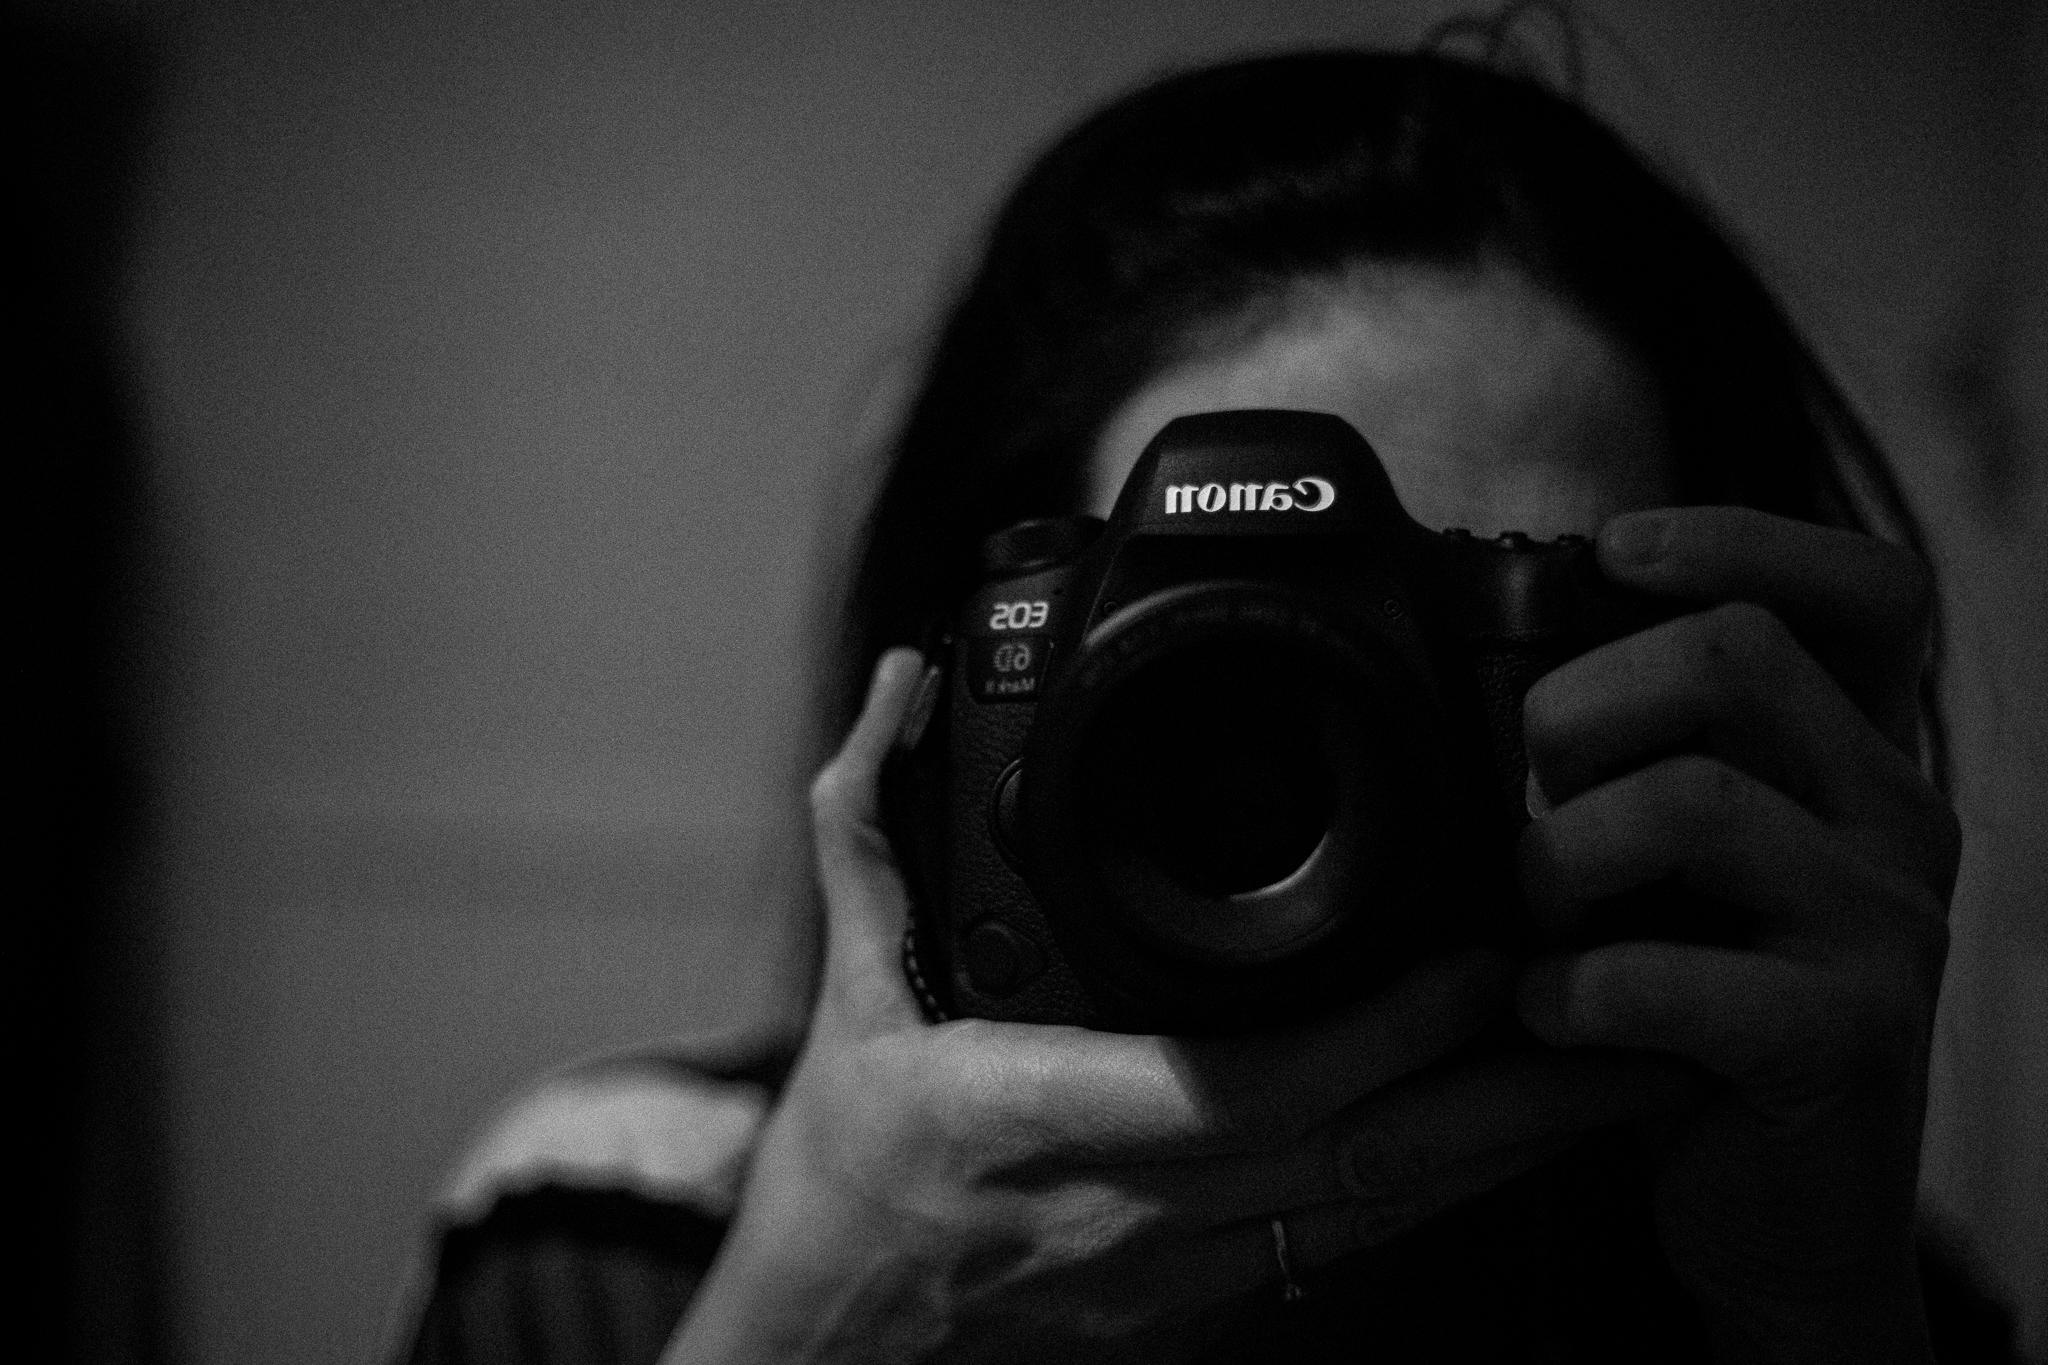 Holding camera